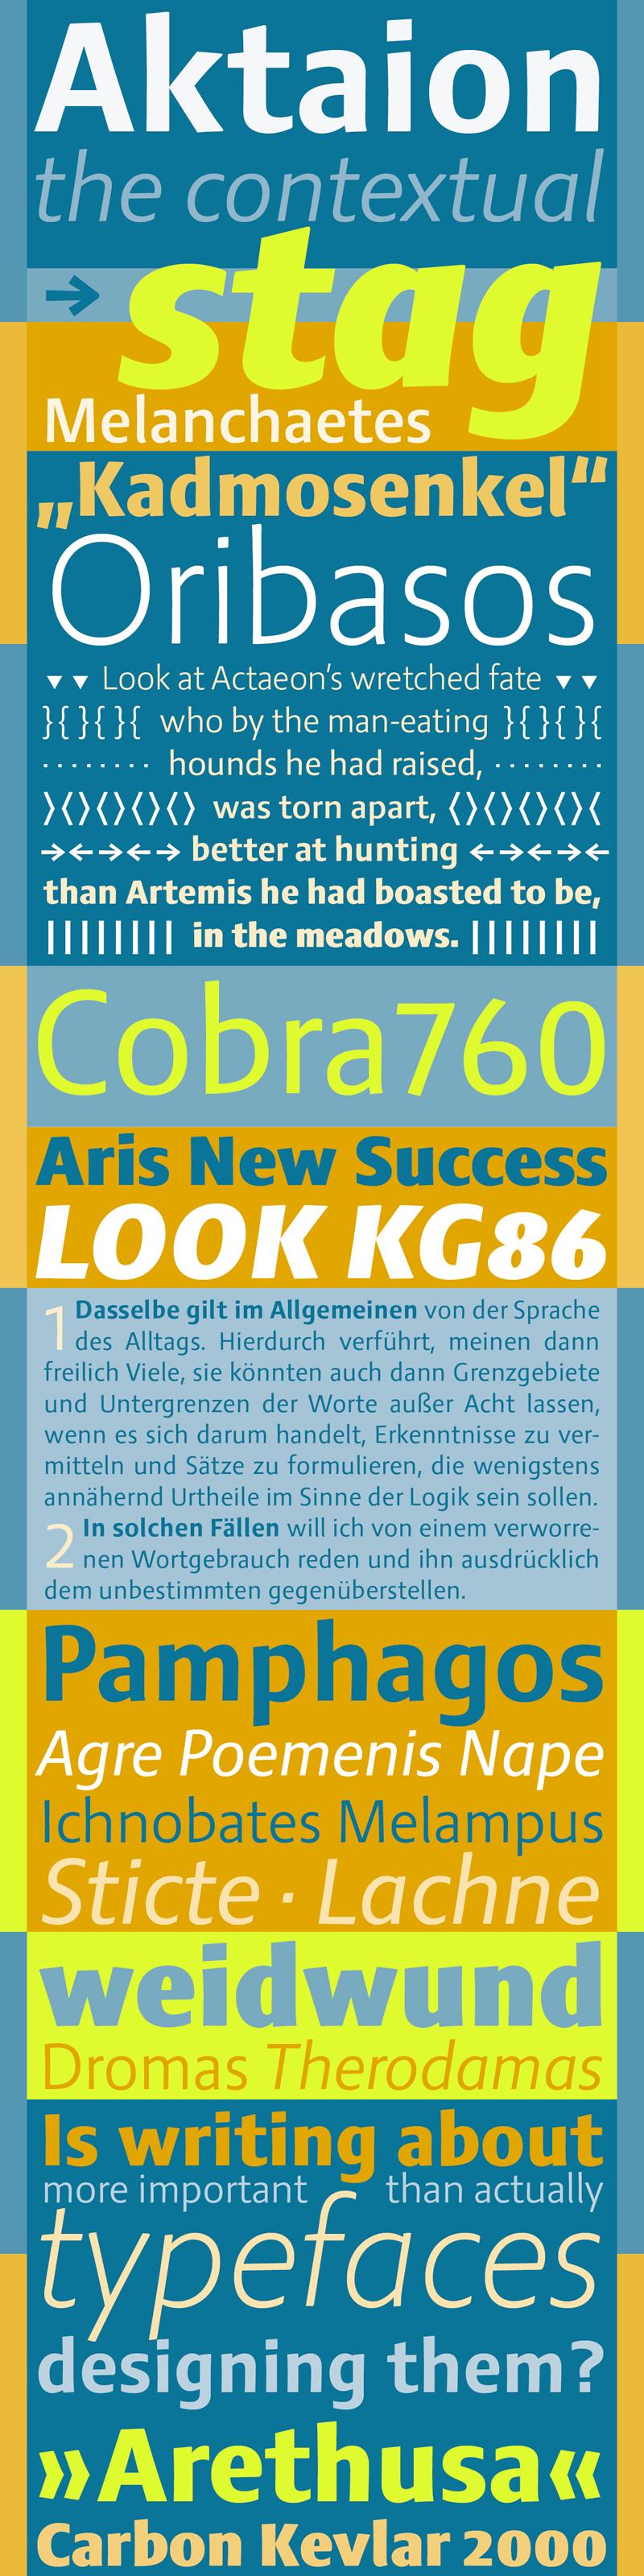 Aktaion font by Jürgen Weltin type matters Pullach